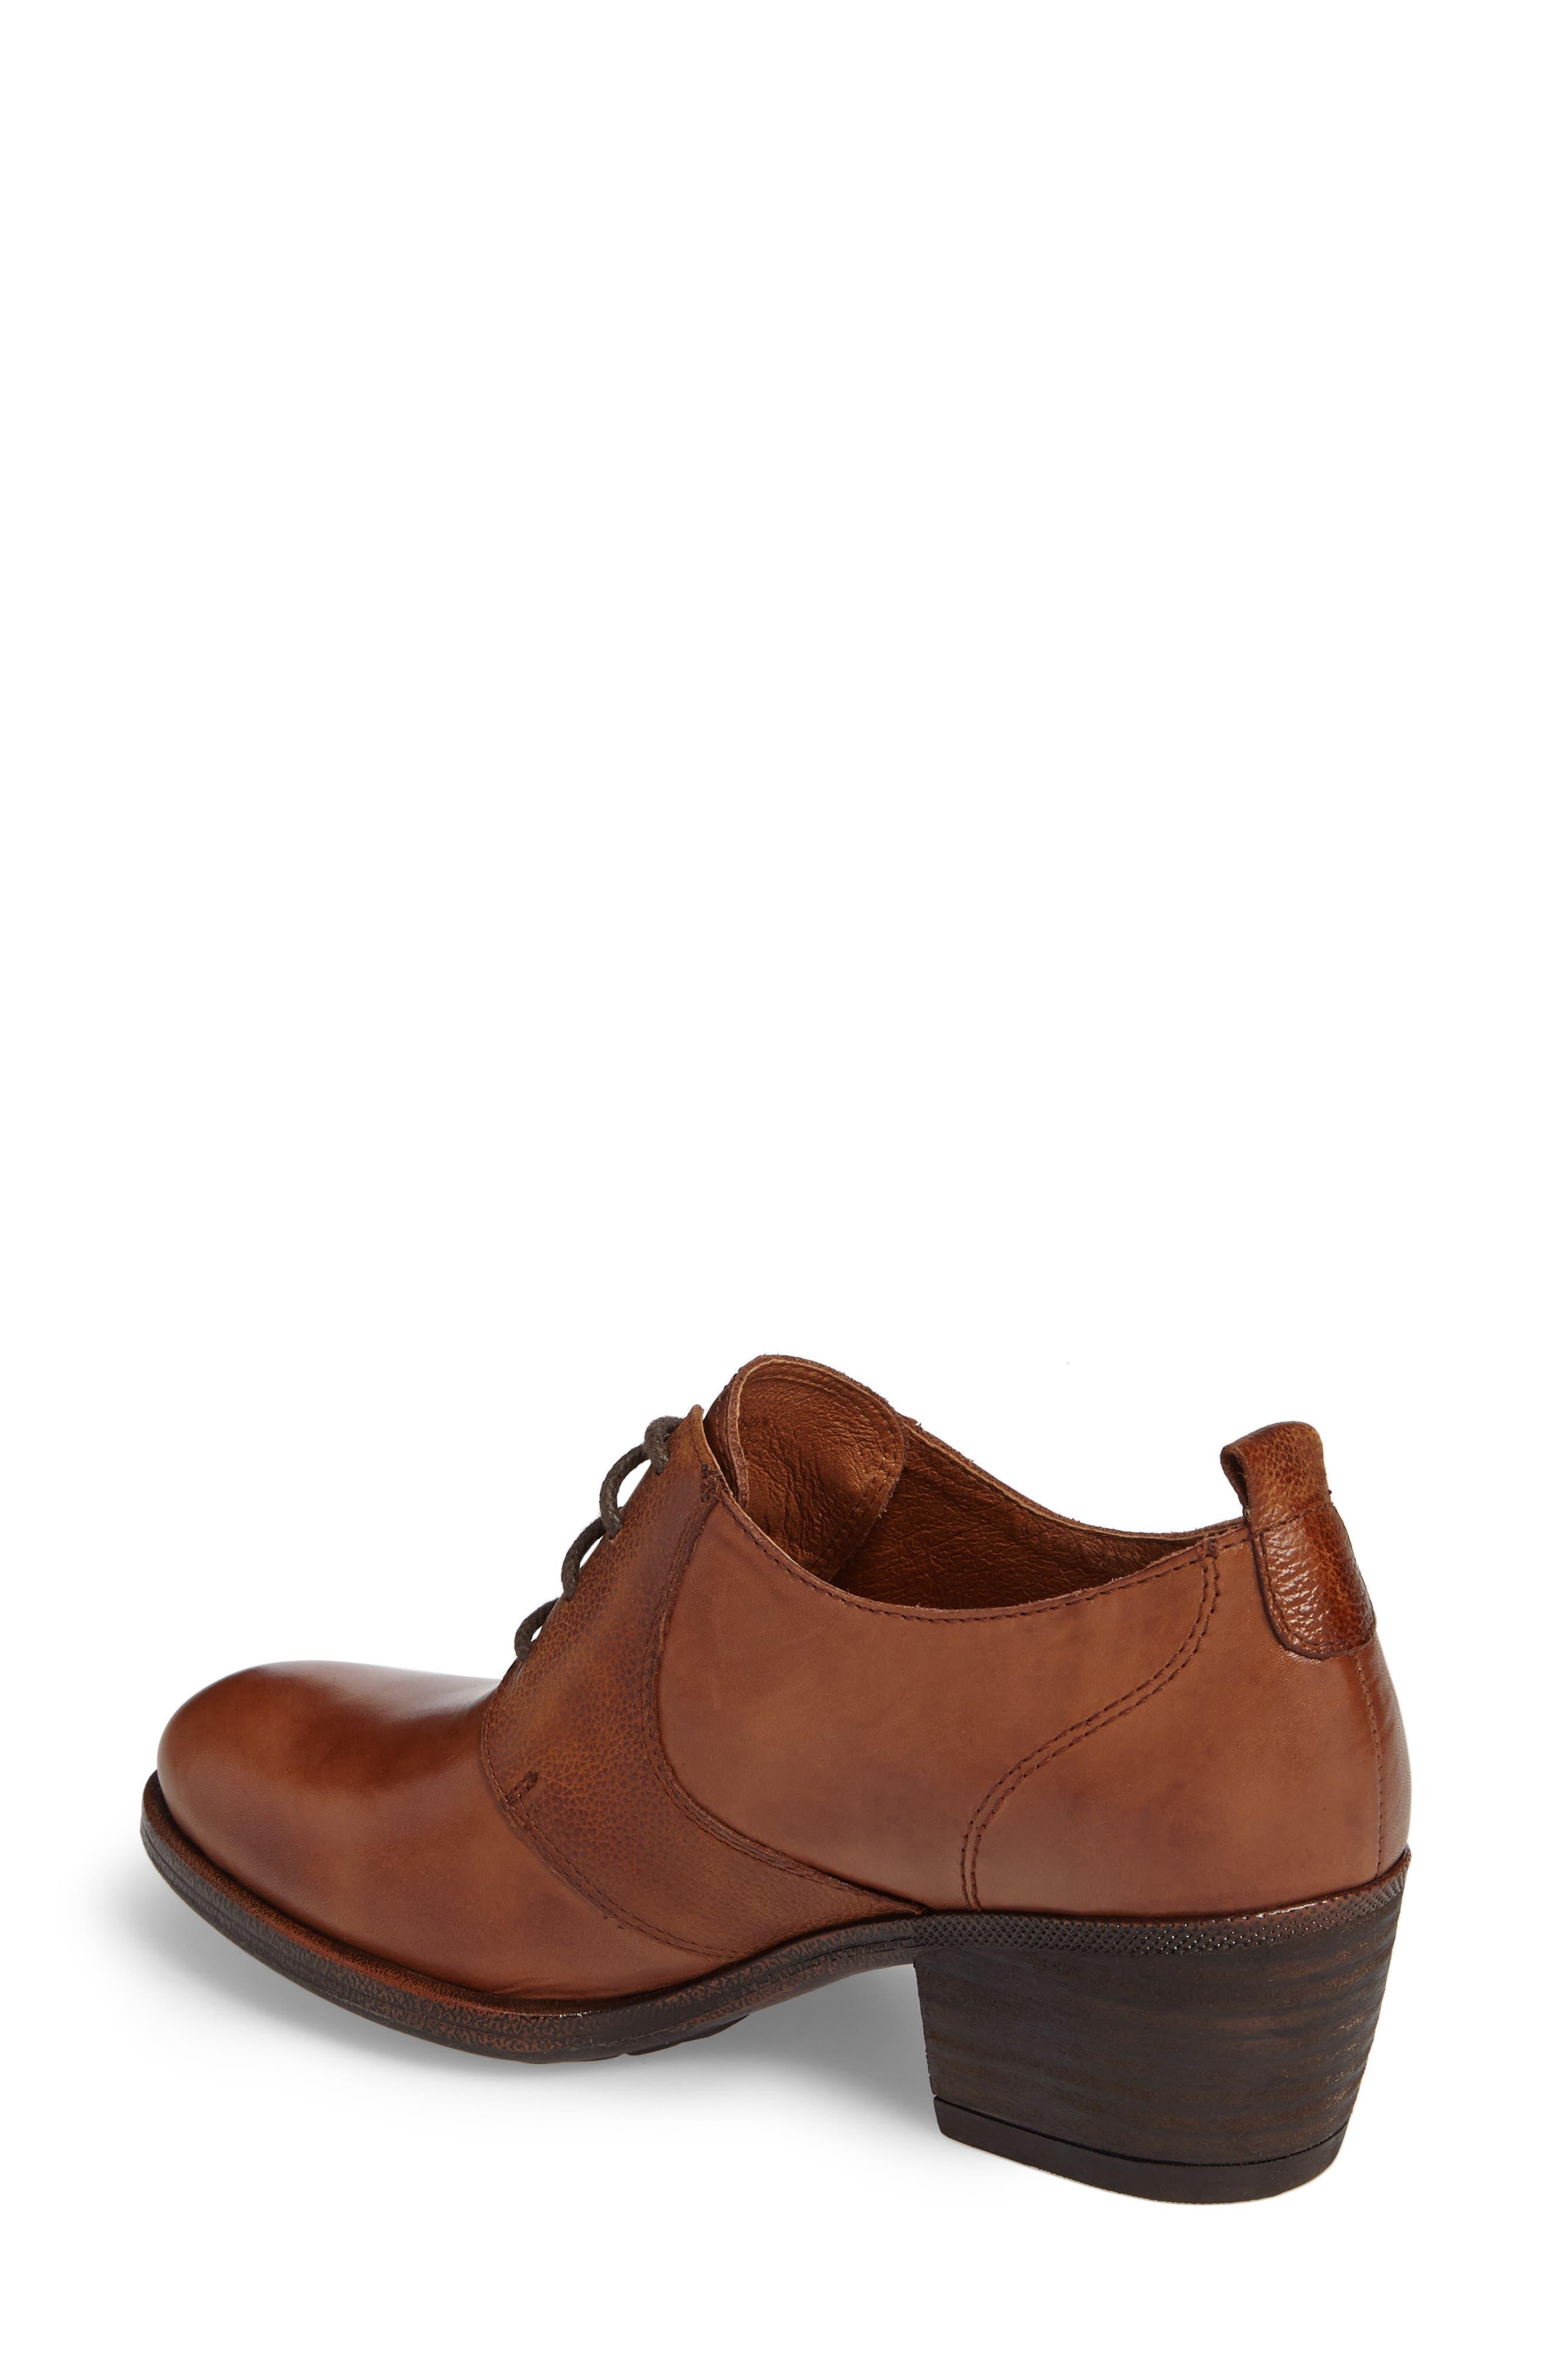 Baqueira Oxford Pump,                             Alternate thumbnail 2, color,                             Cuero Brandy Leather